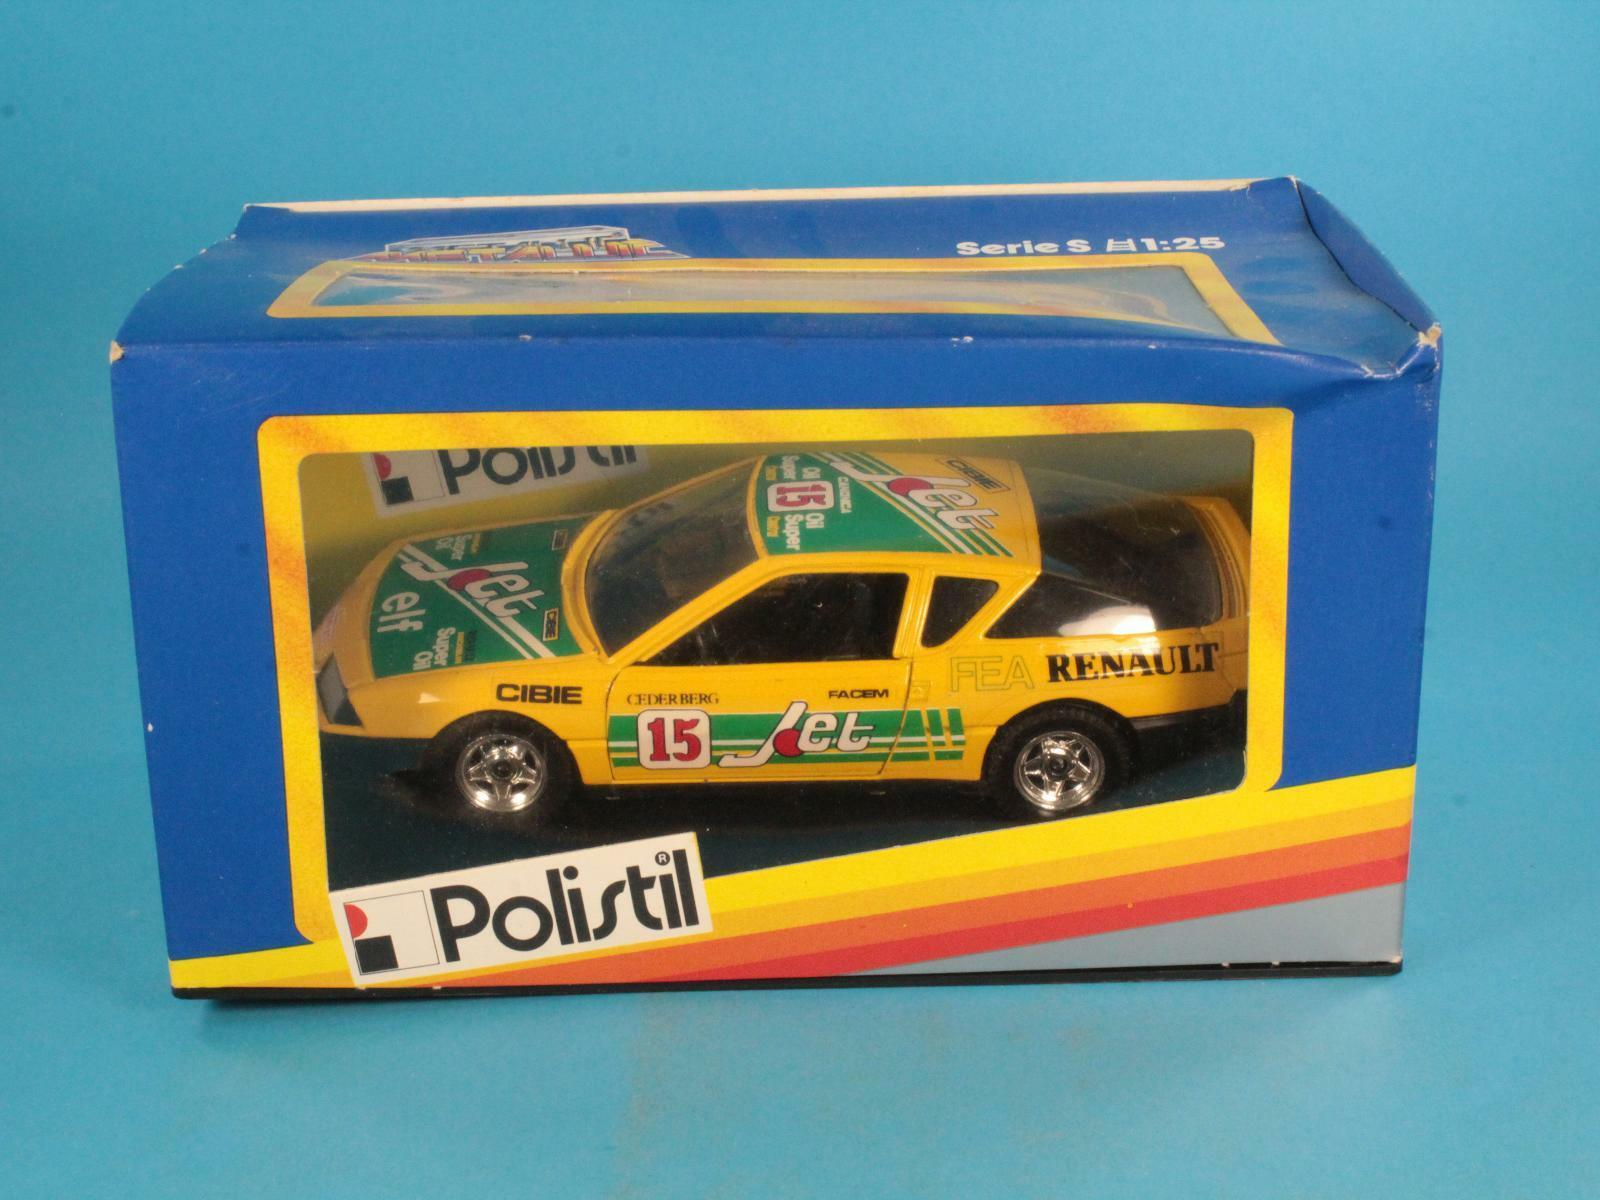 1 25 POLISTIL S 02304 RENAULT ALPINE TURBO FONDO MAGAZZINO [RU3-015]